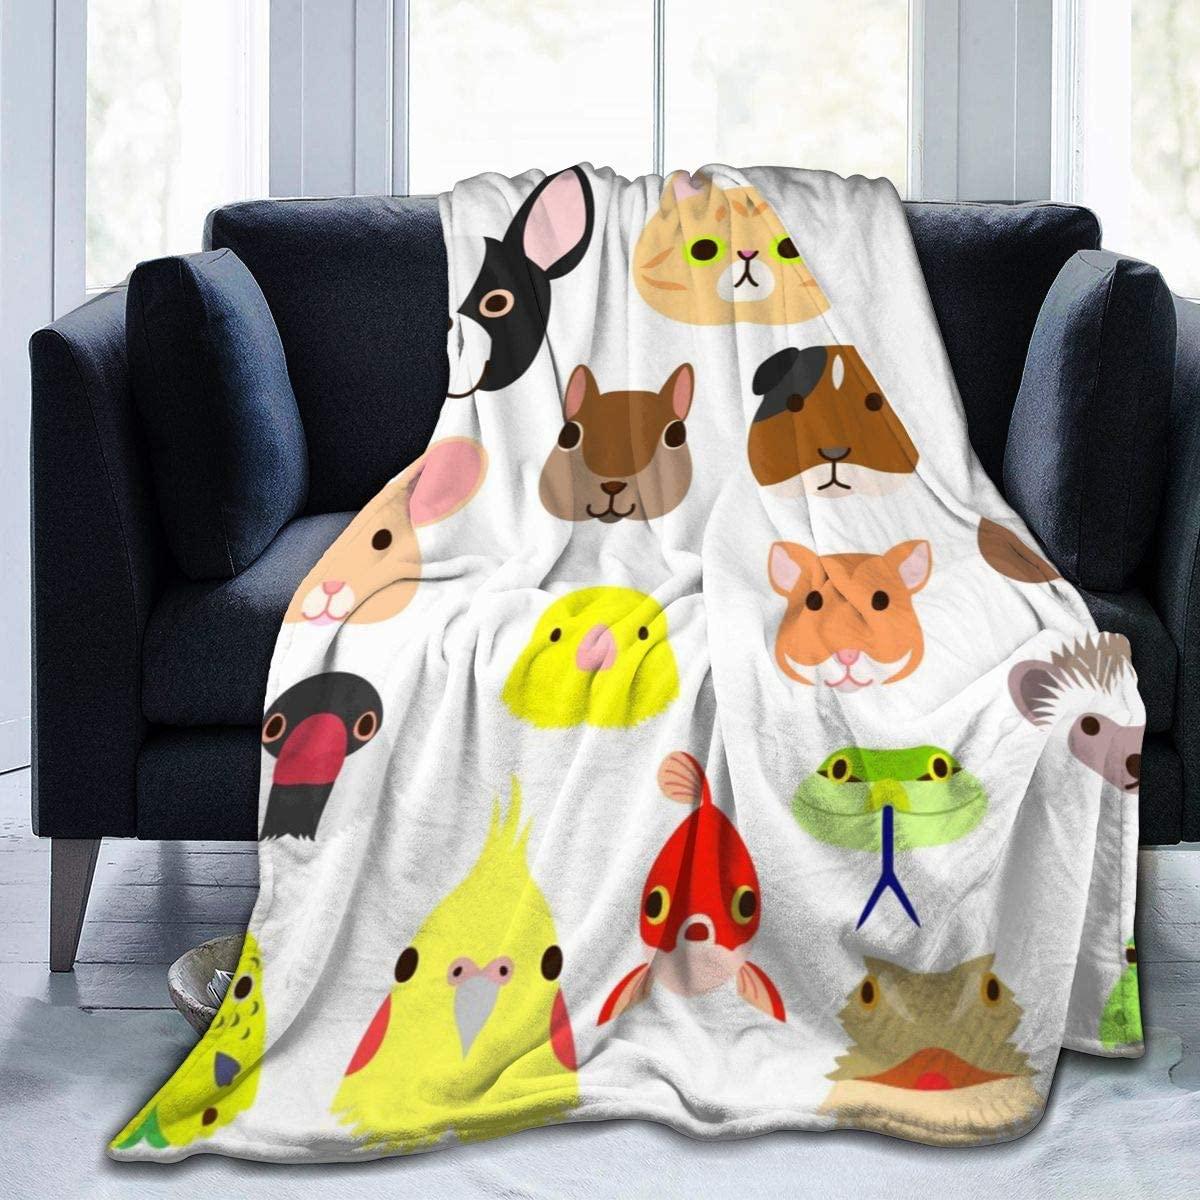 Micro Fleece Plush Soft Baby Blanket Pet Animals Faces Colorful Set Fluffy Warm Toddler Bed/Crib Blanket Lightweight Flannel Daycare Nap Kids Sleeping Tummy Time Throw Blanket Girls Boy Kid/Baby